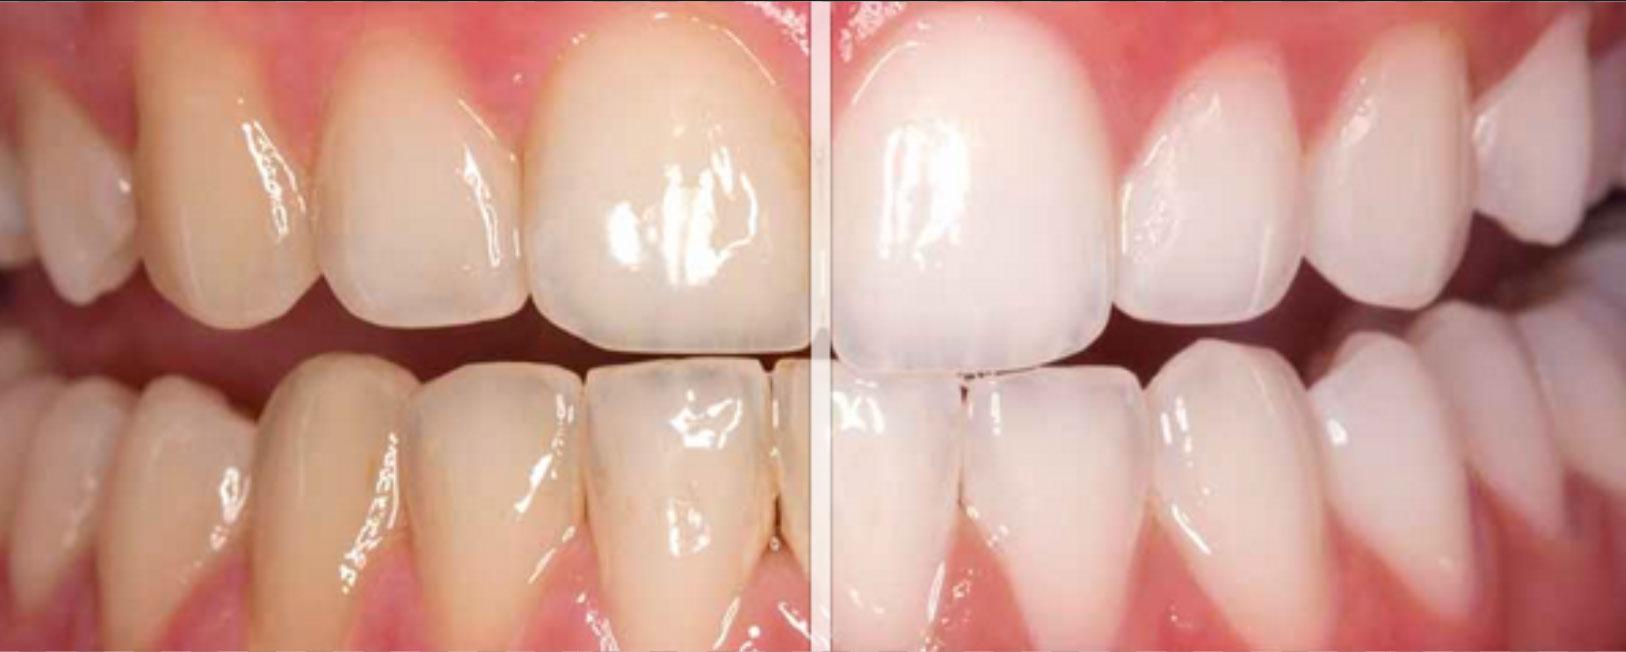 sbiancamenti dentali